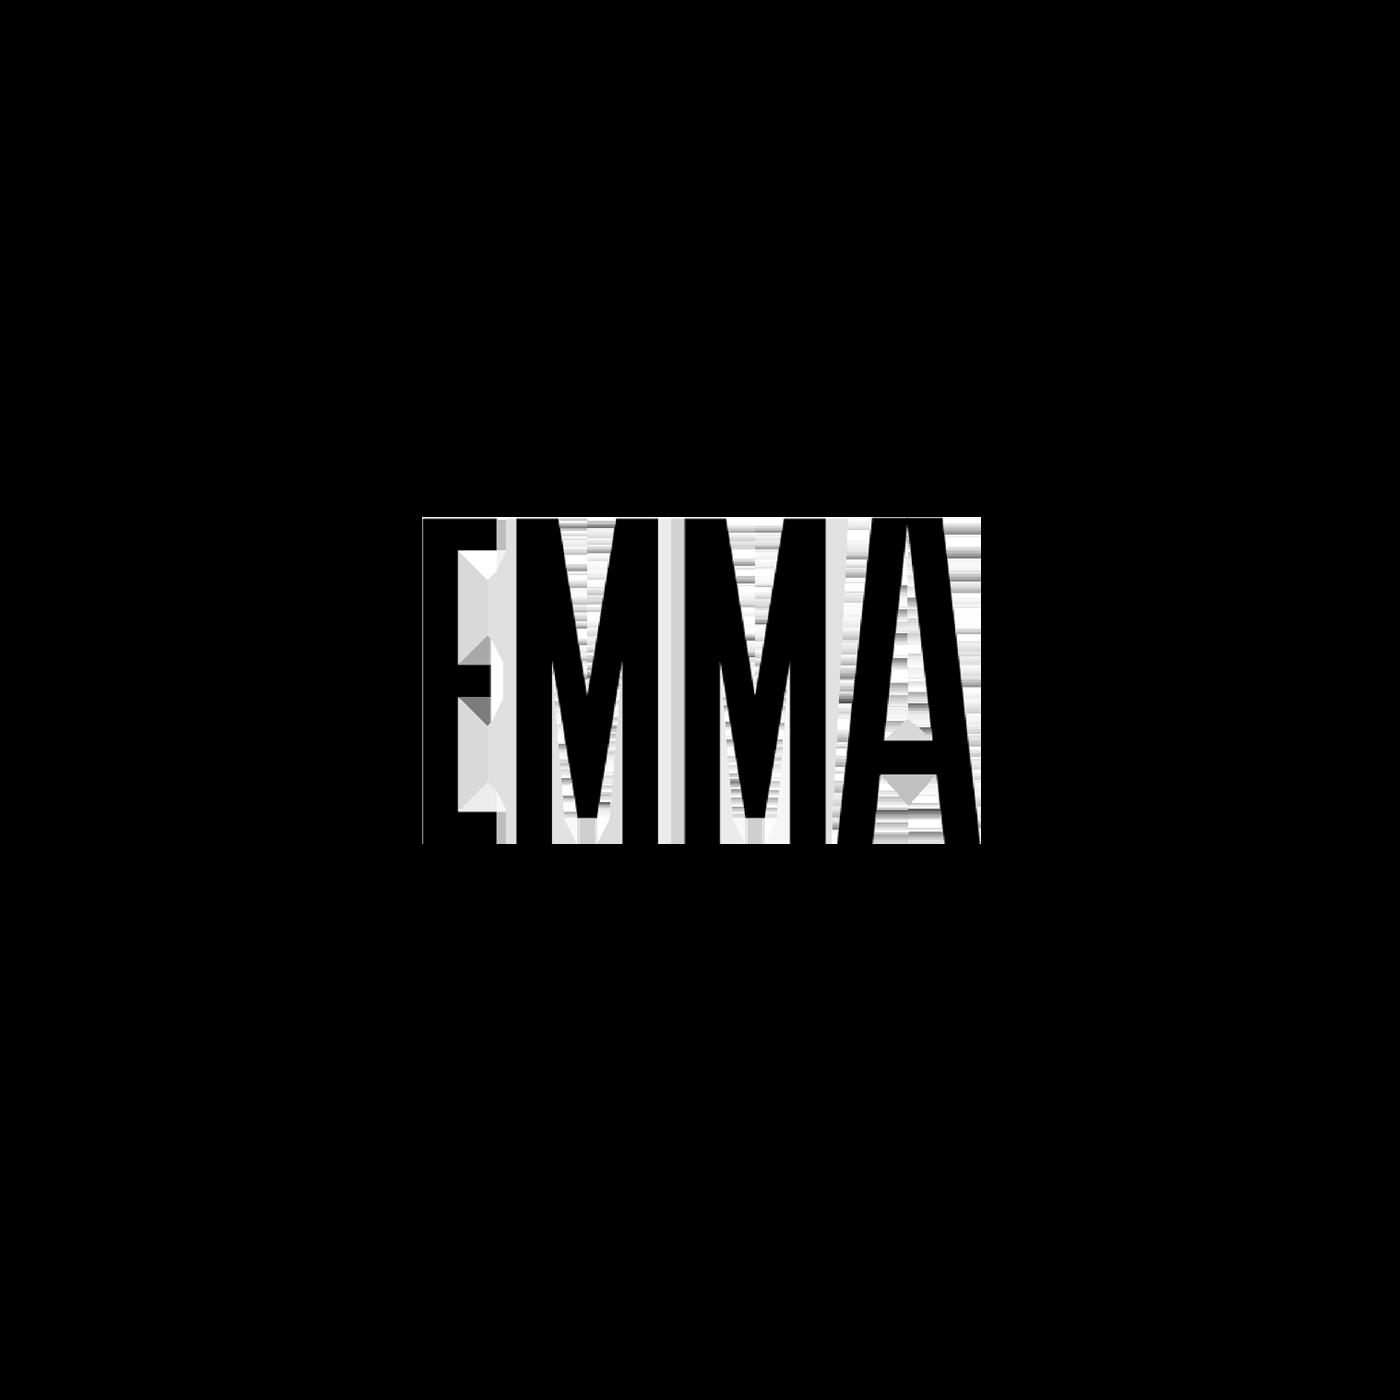 emma-square.png